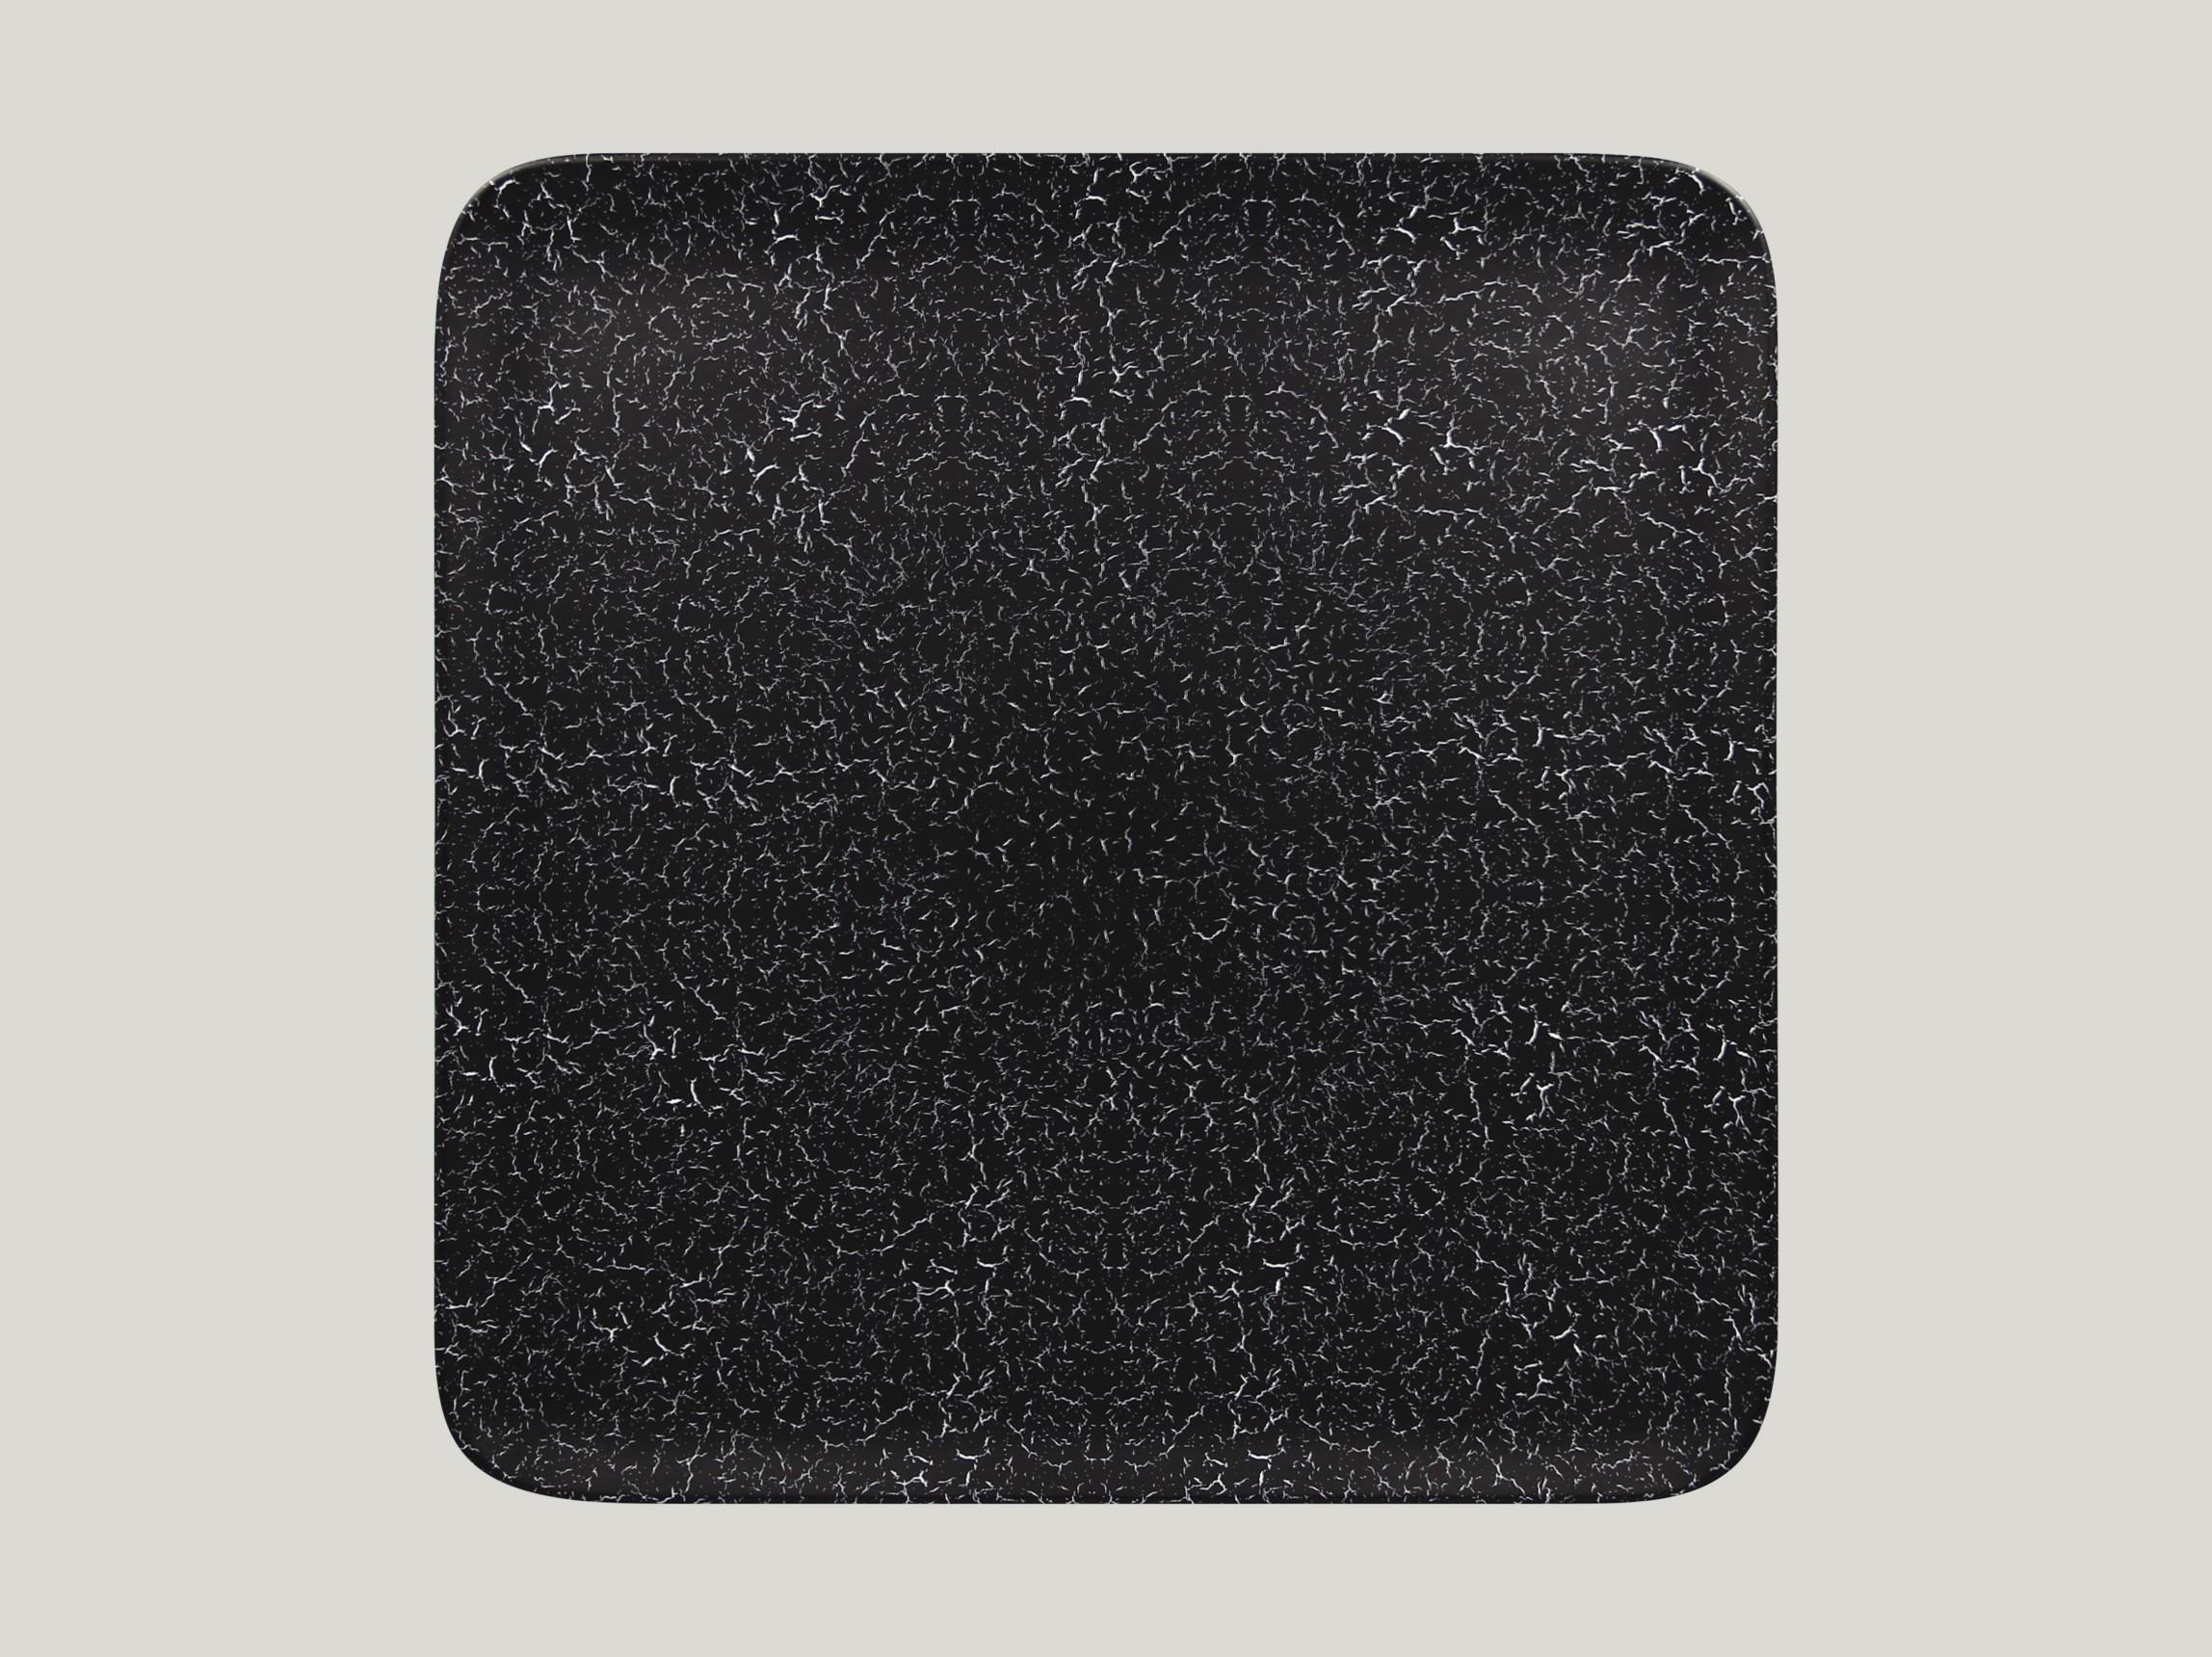 Talíř čtvercový 33 x 33 cm - černá